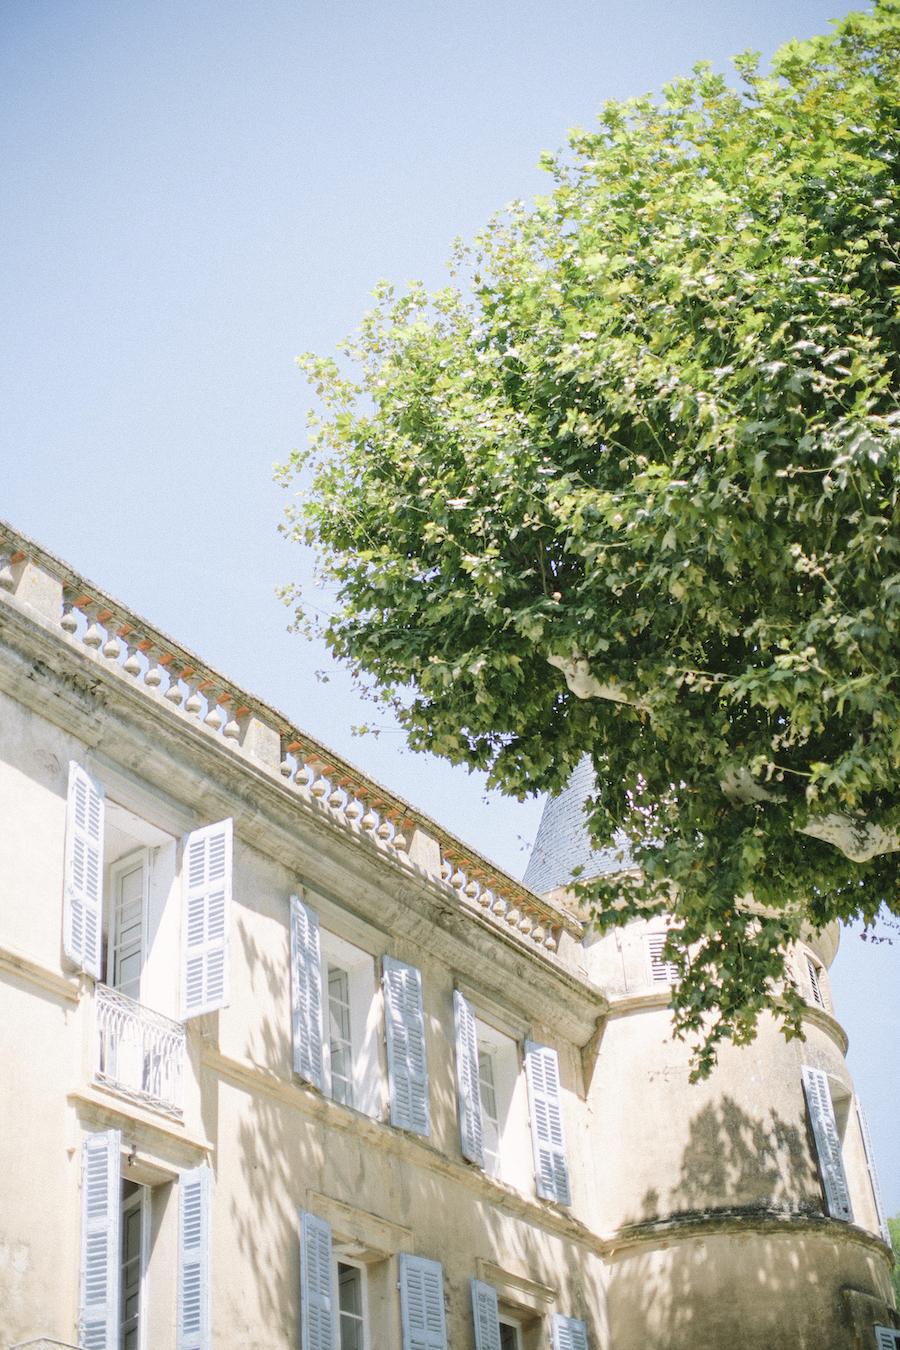 saya-photography-wedding-photographer-provence-chateau-de-robernier-10.jpg